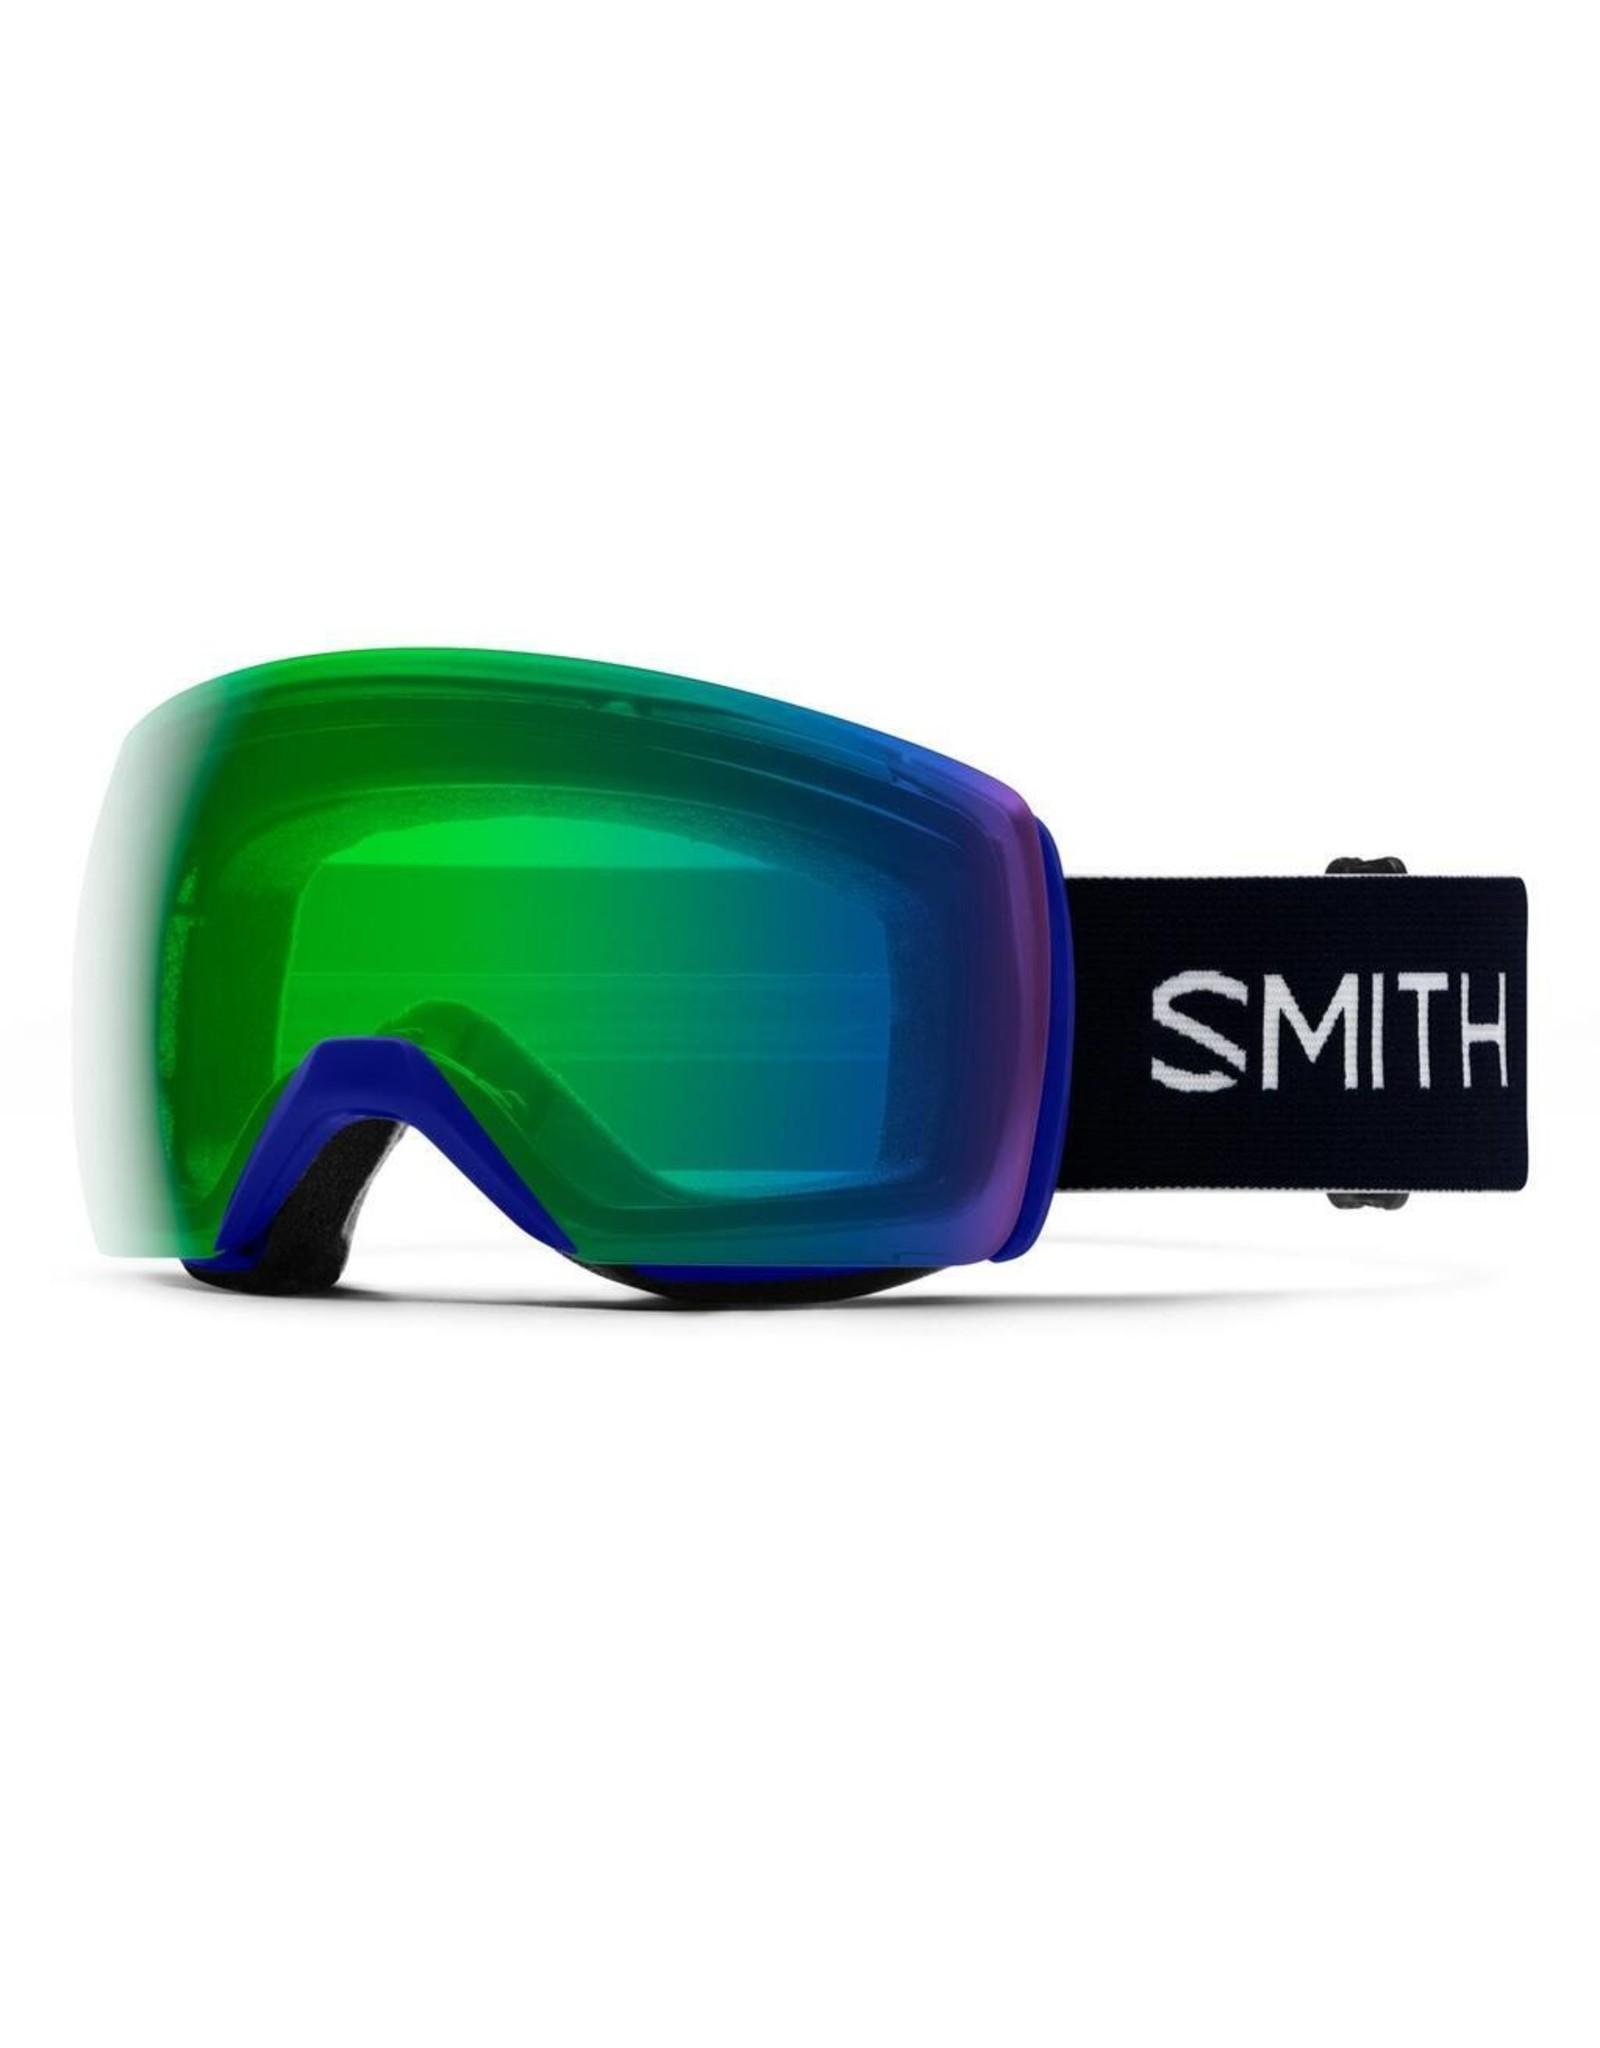 SMITH SKYLINE XL  KLEIN BLUE GREEN